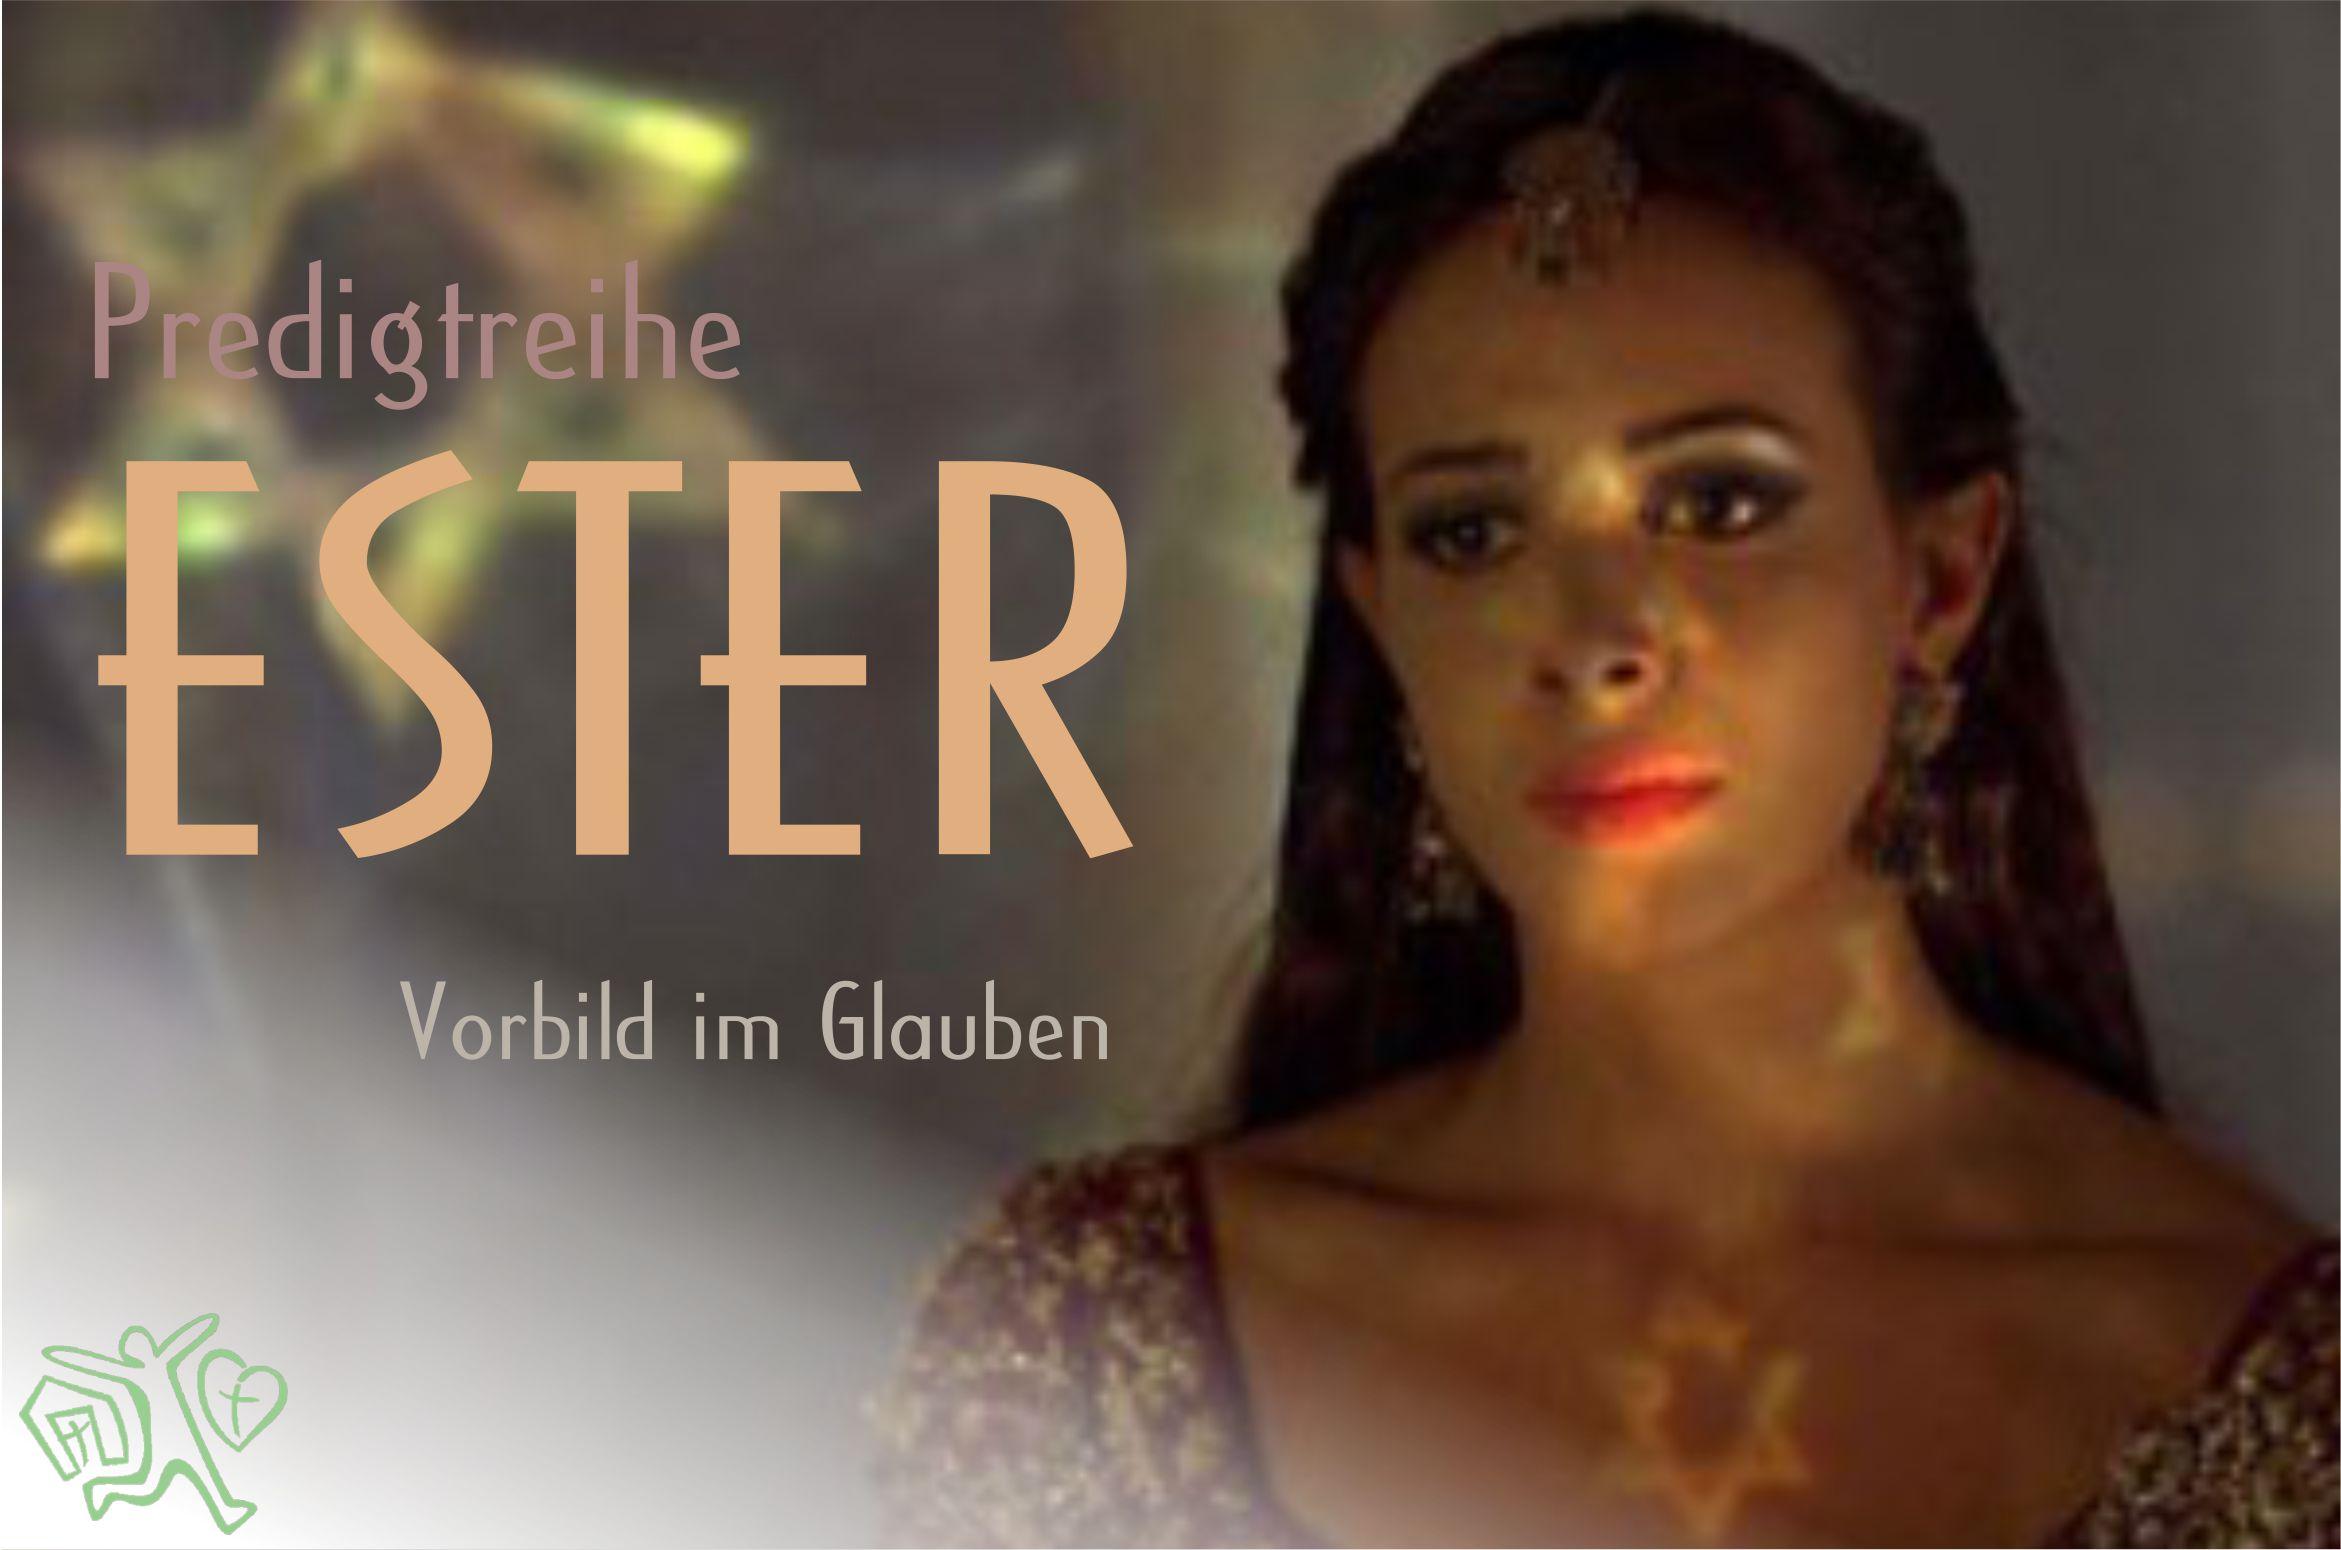 Predigtreihe_Ester_2021